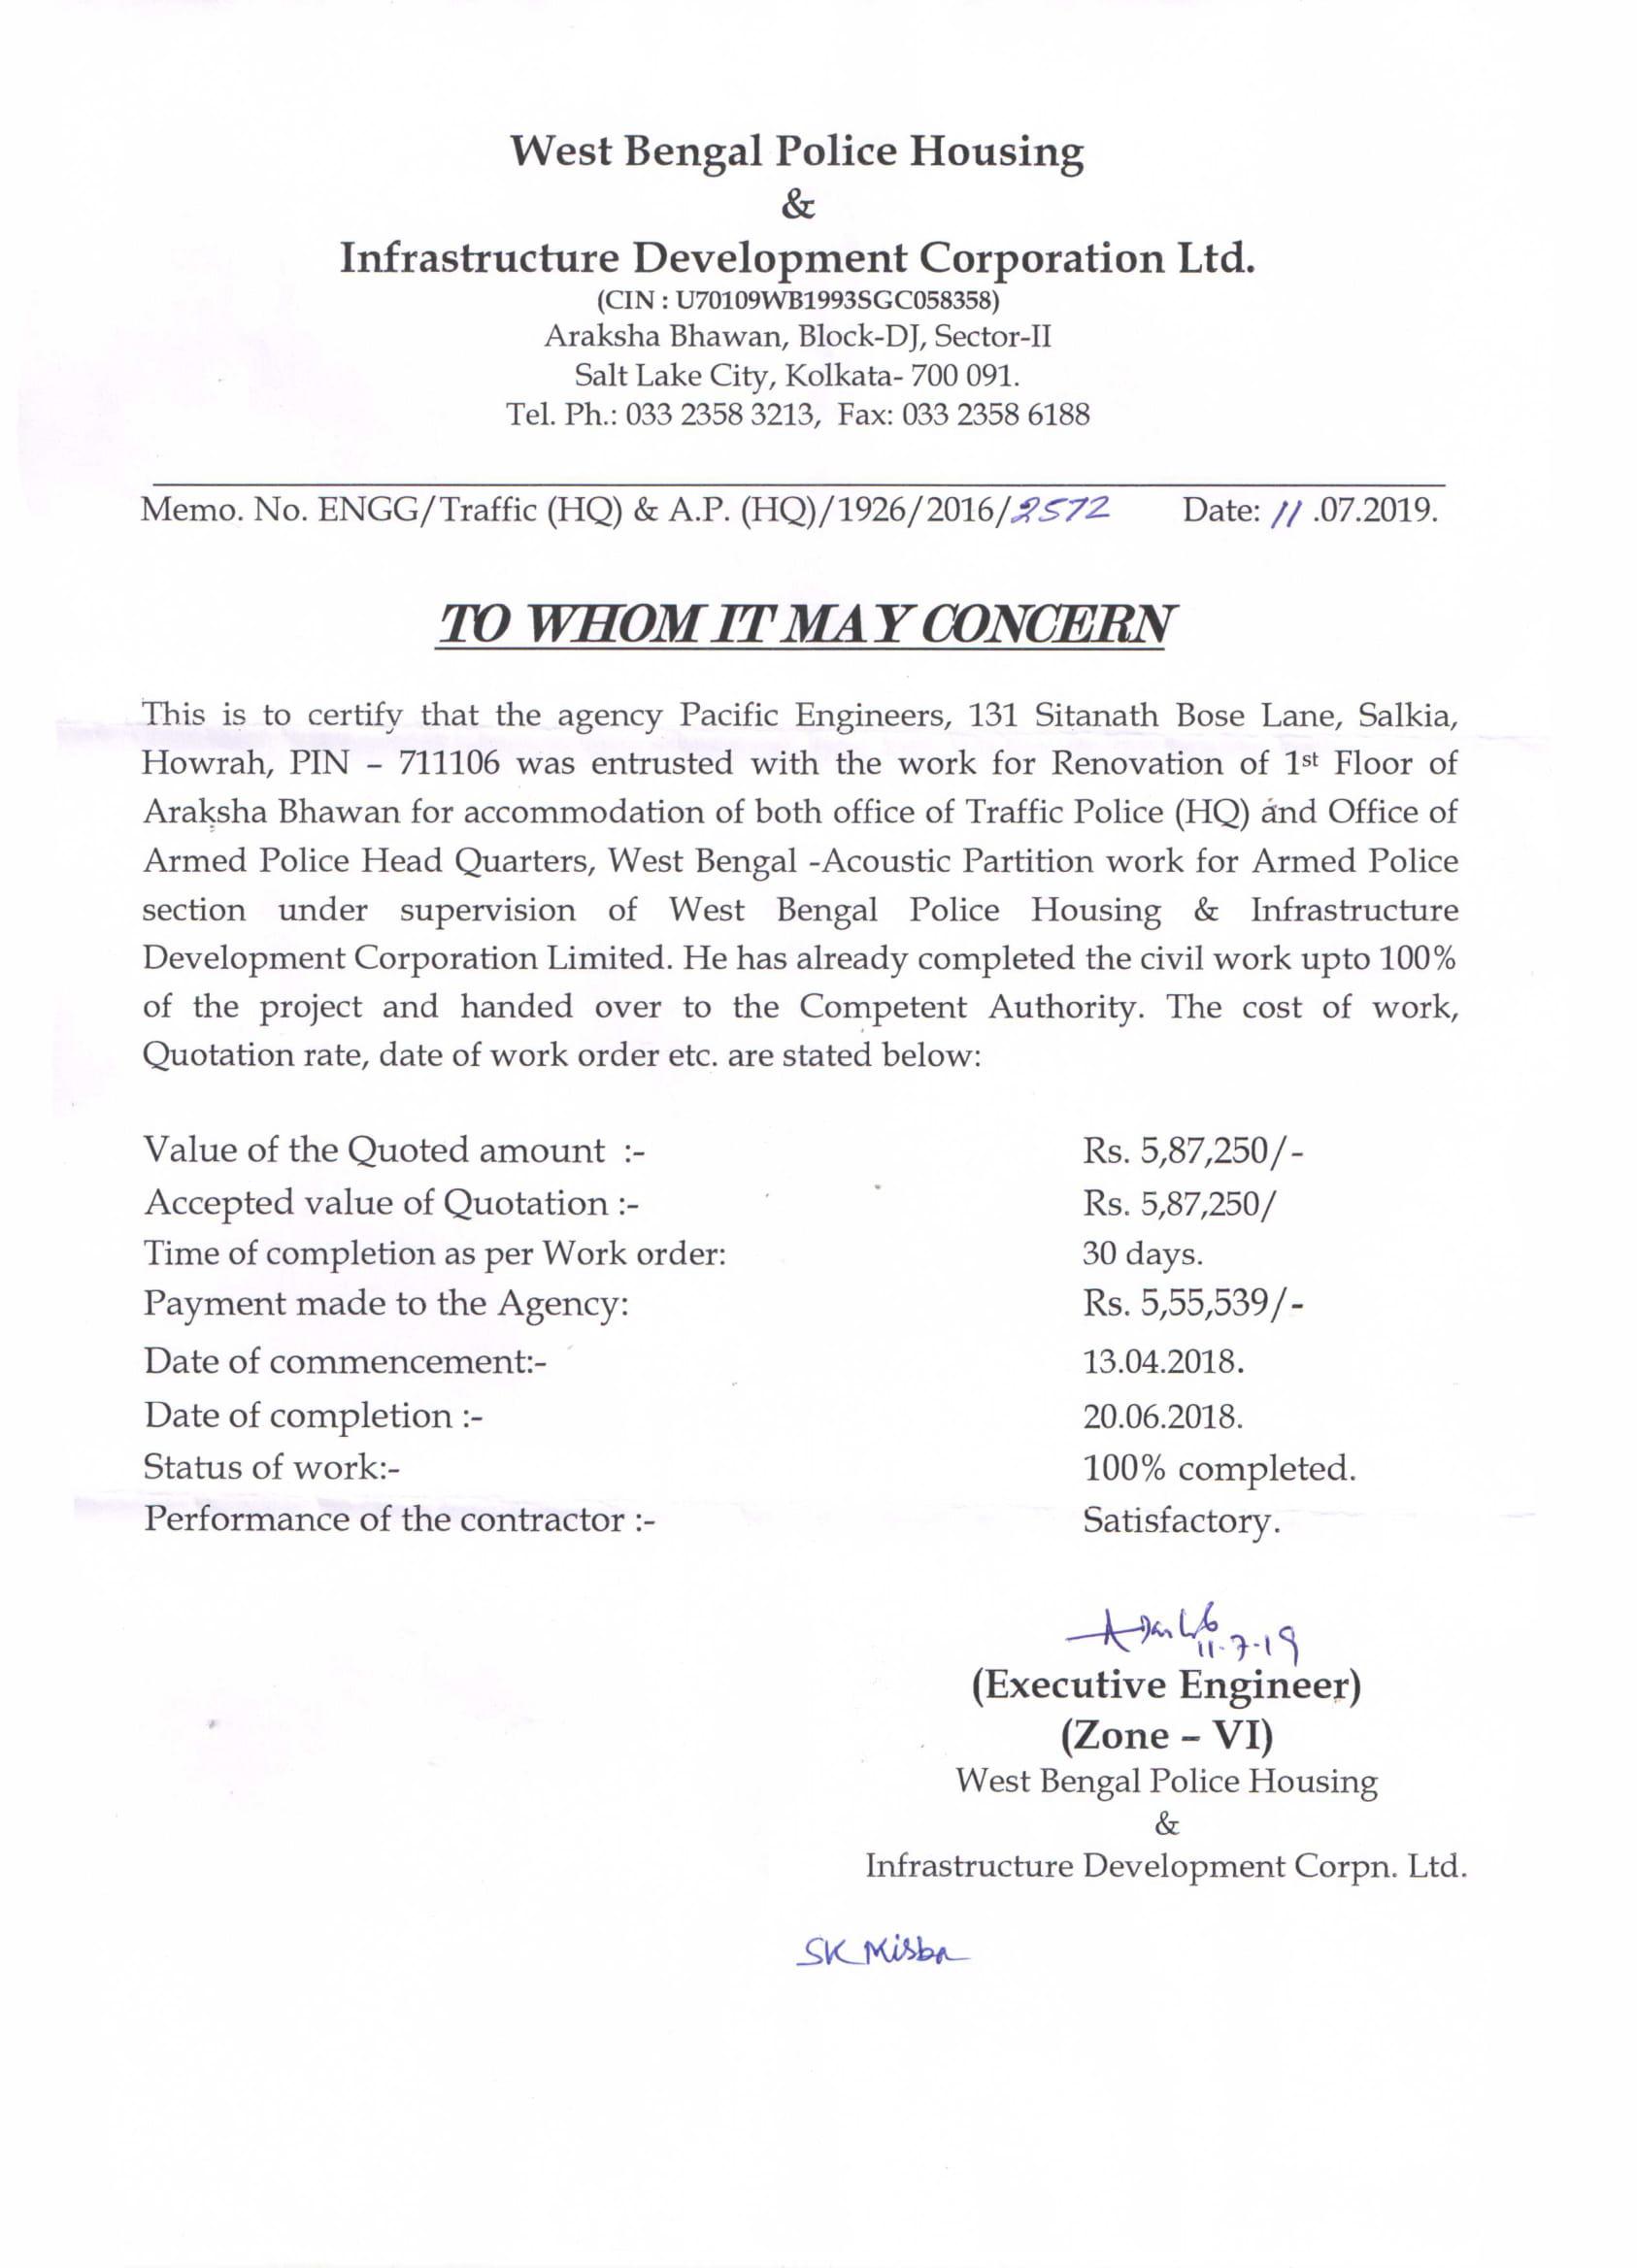 WBPHIDC Ltd_COMPLETION CERTIFICATE (1)-1